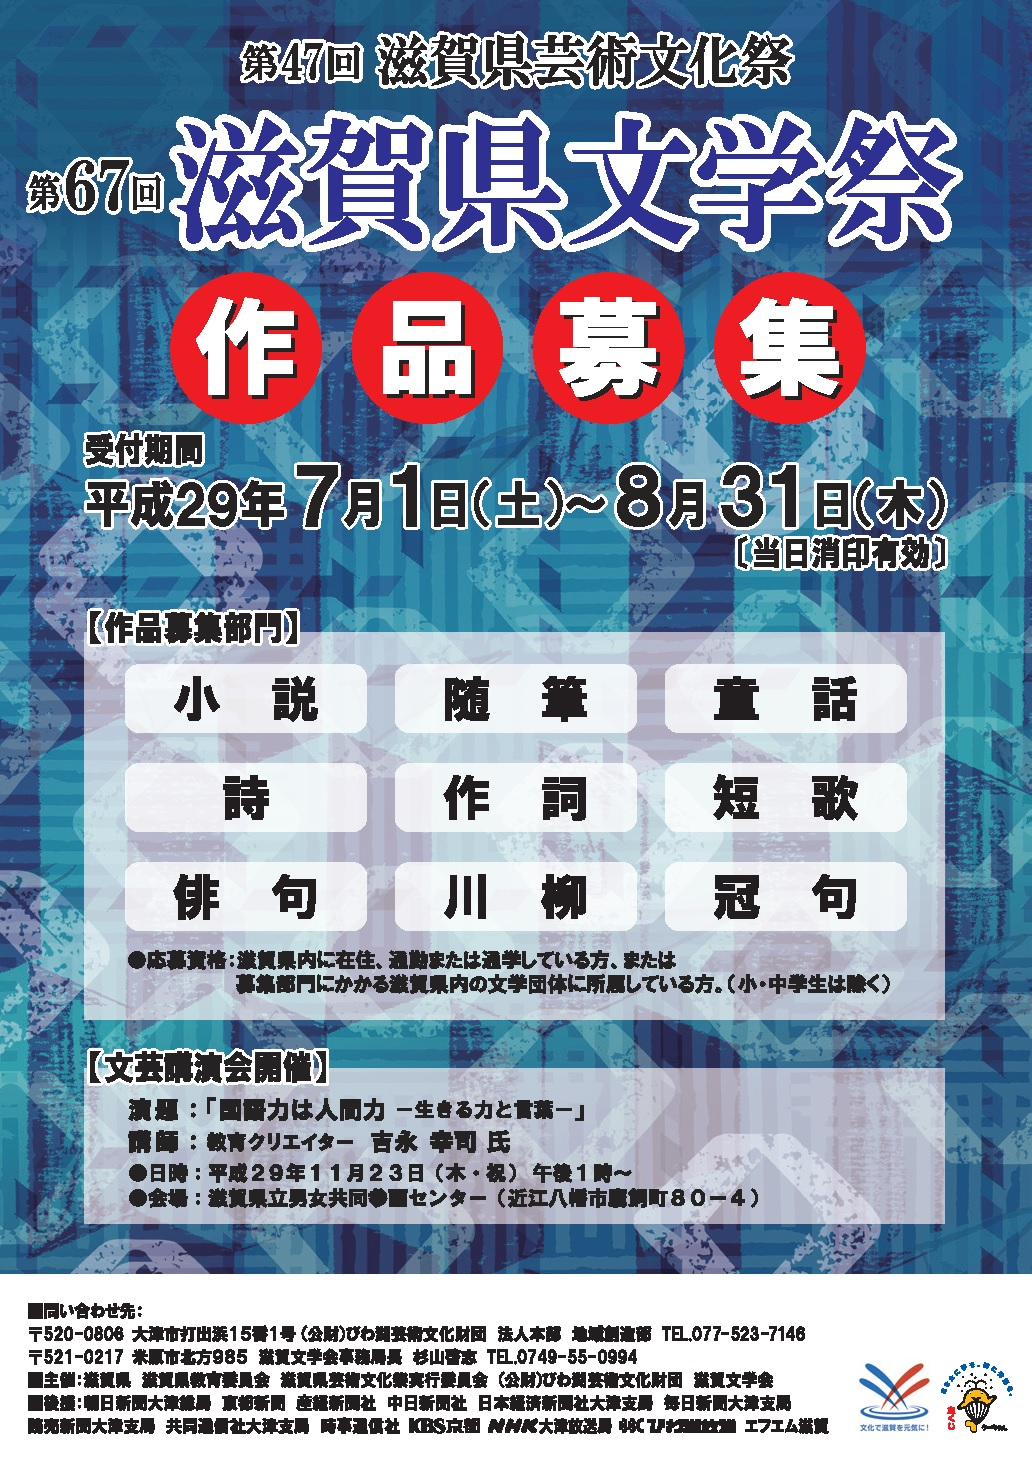 第66回滋賀県文学祭ポスター